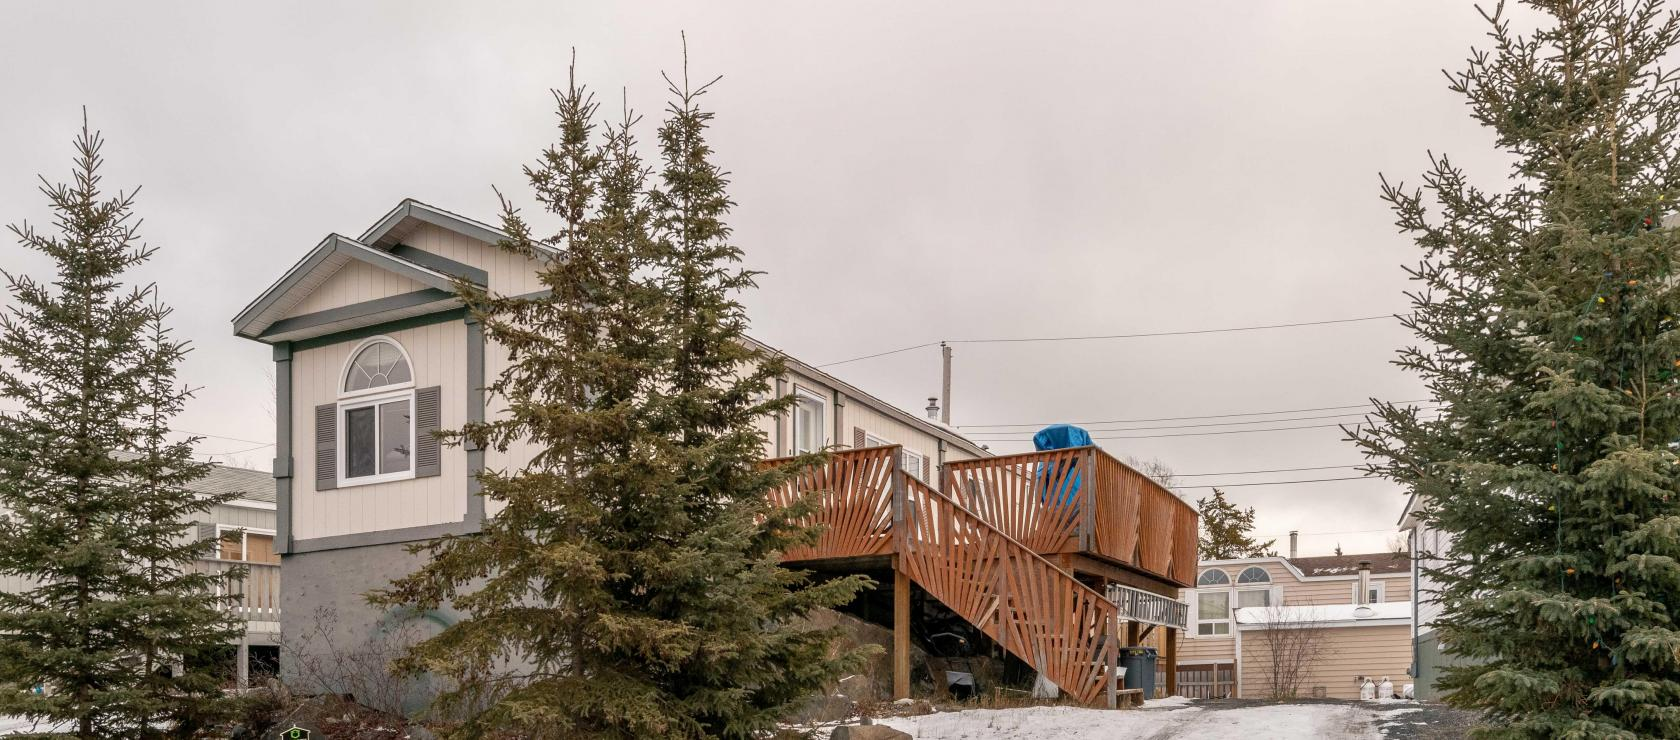 181 Jeske Crescent, Range Lake, Yellowknife 2